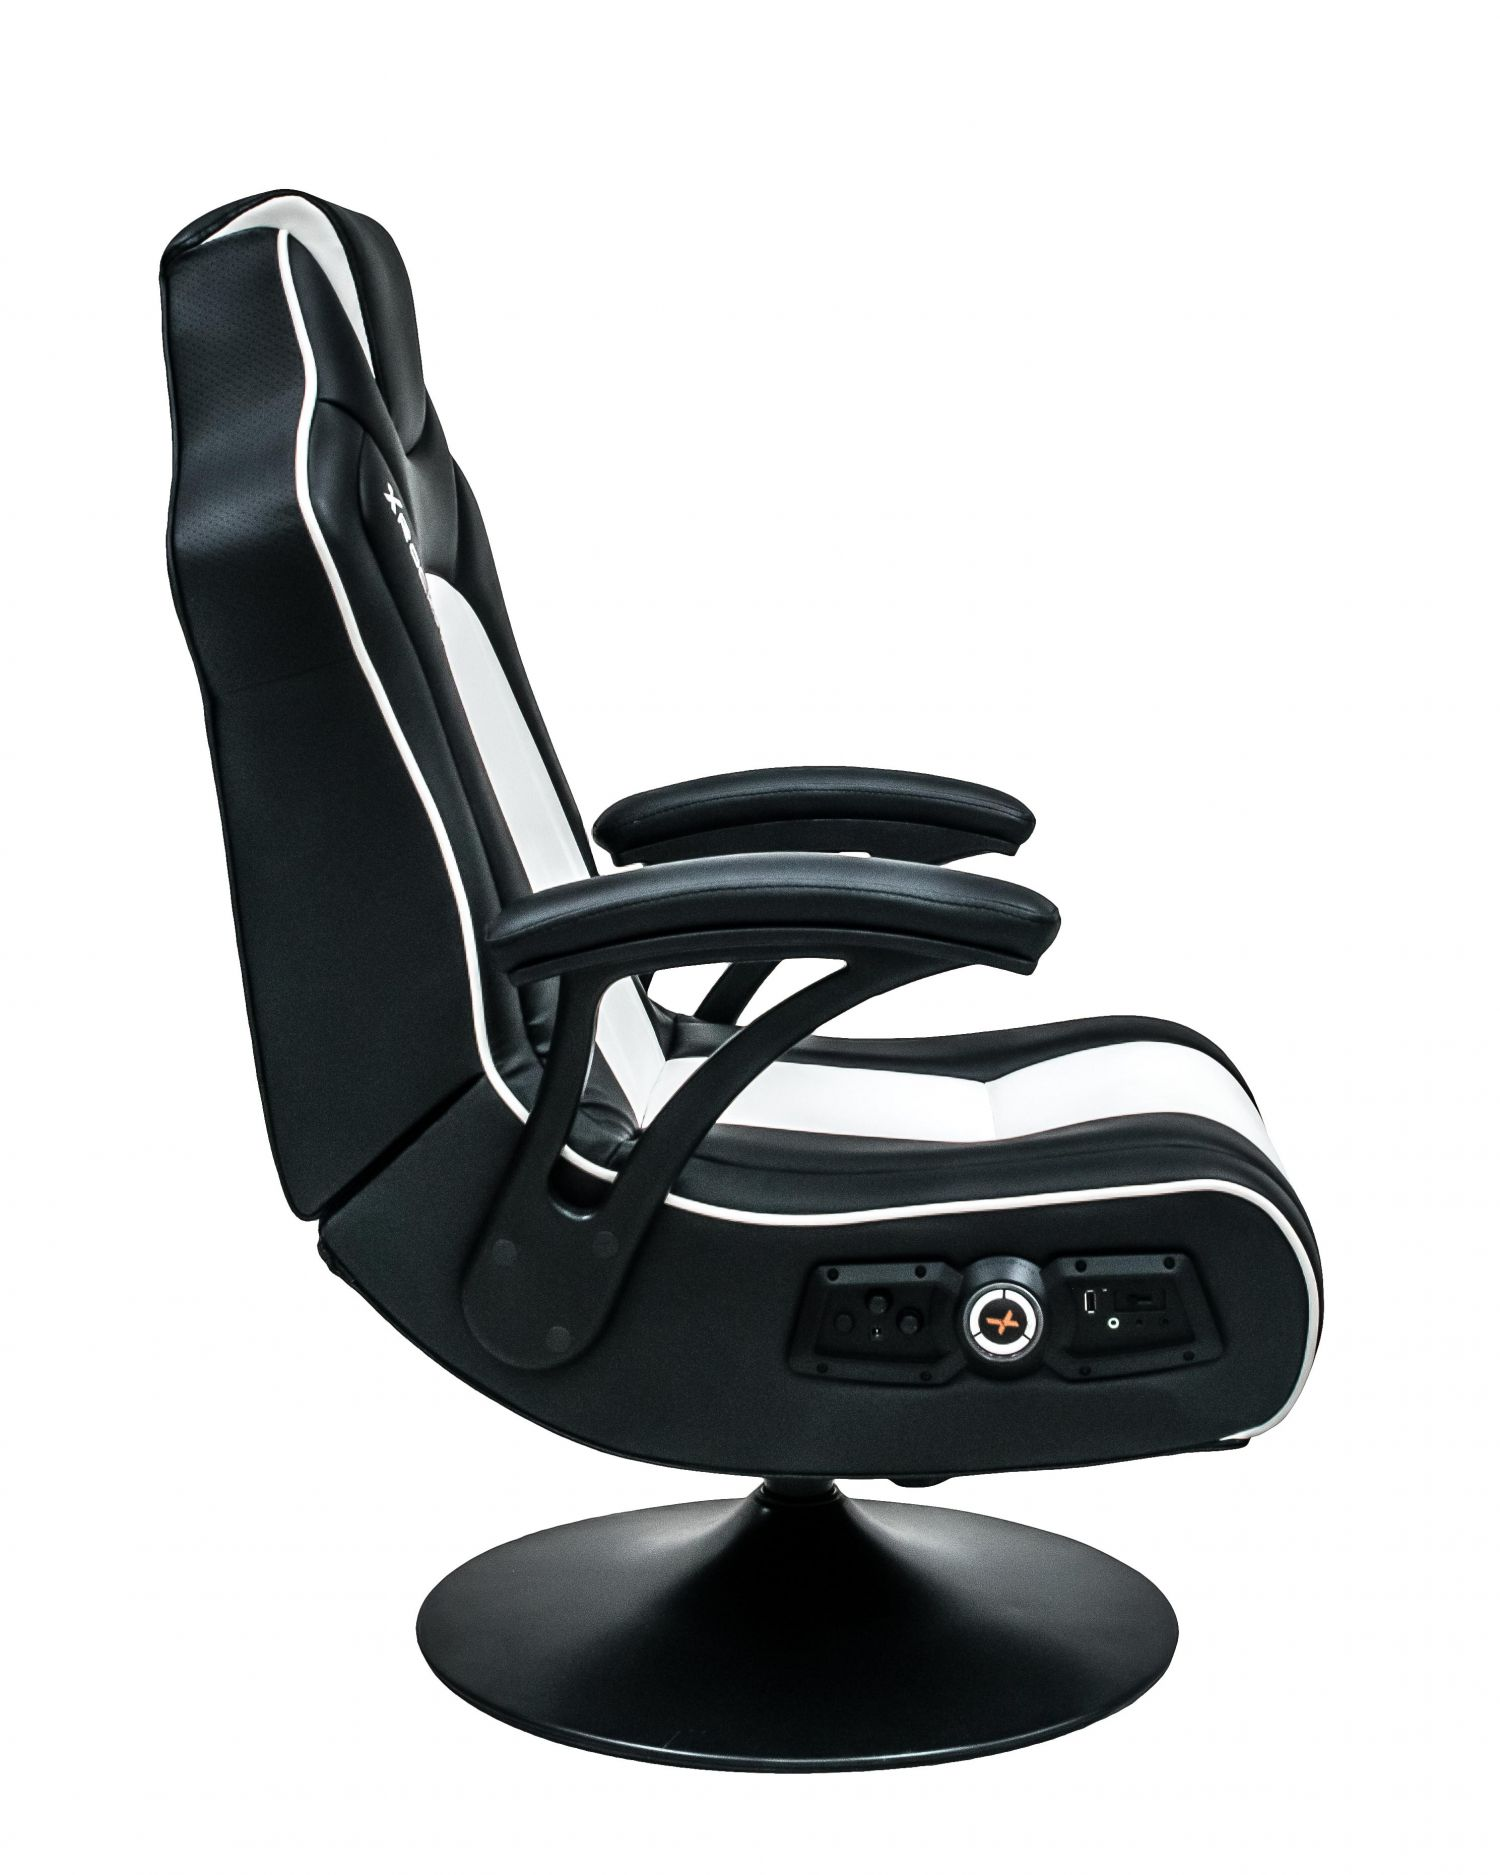 Tremendous Xrocker Torque 2 1 Nordic Game Supply Machost Co Dining Chair Design Ideas Machostcouk